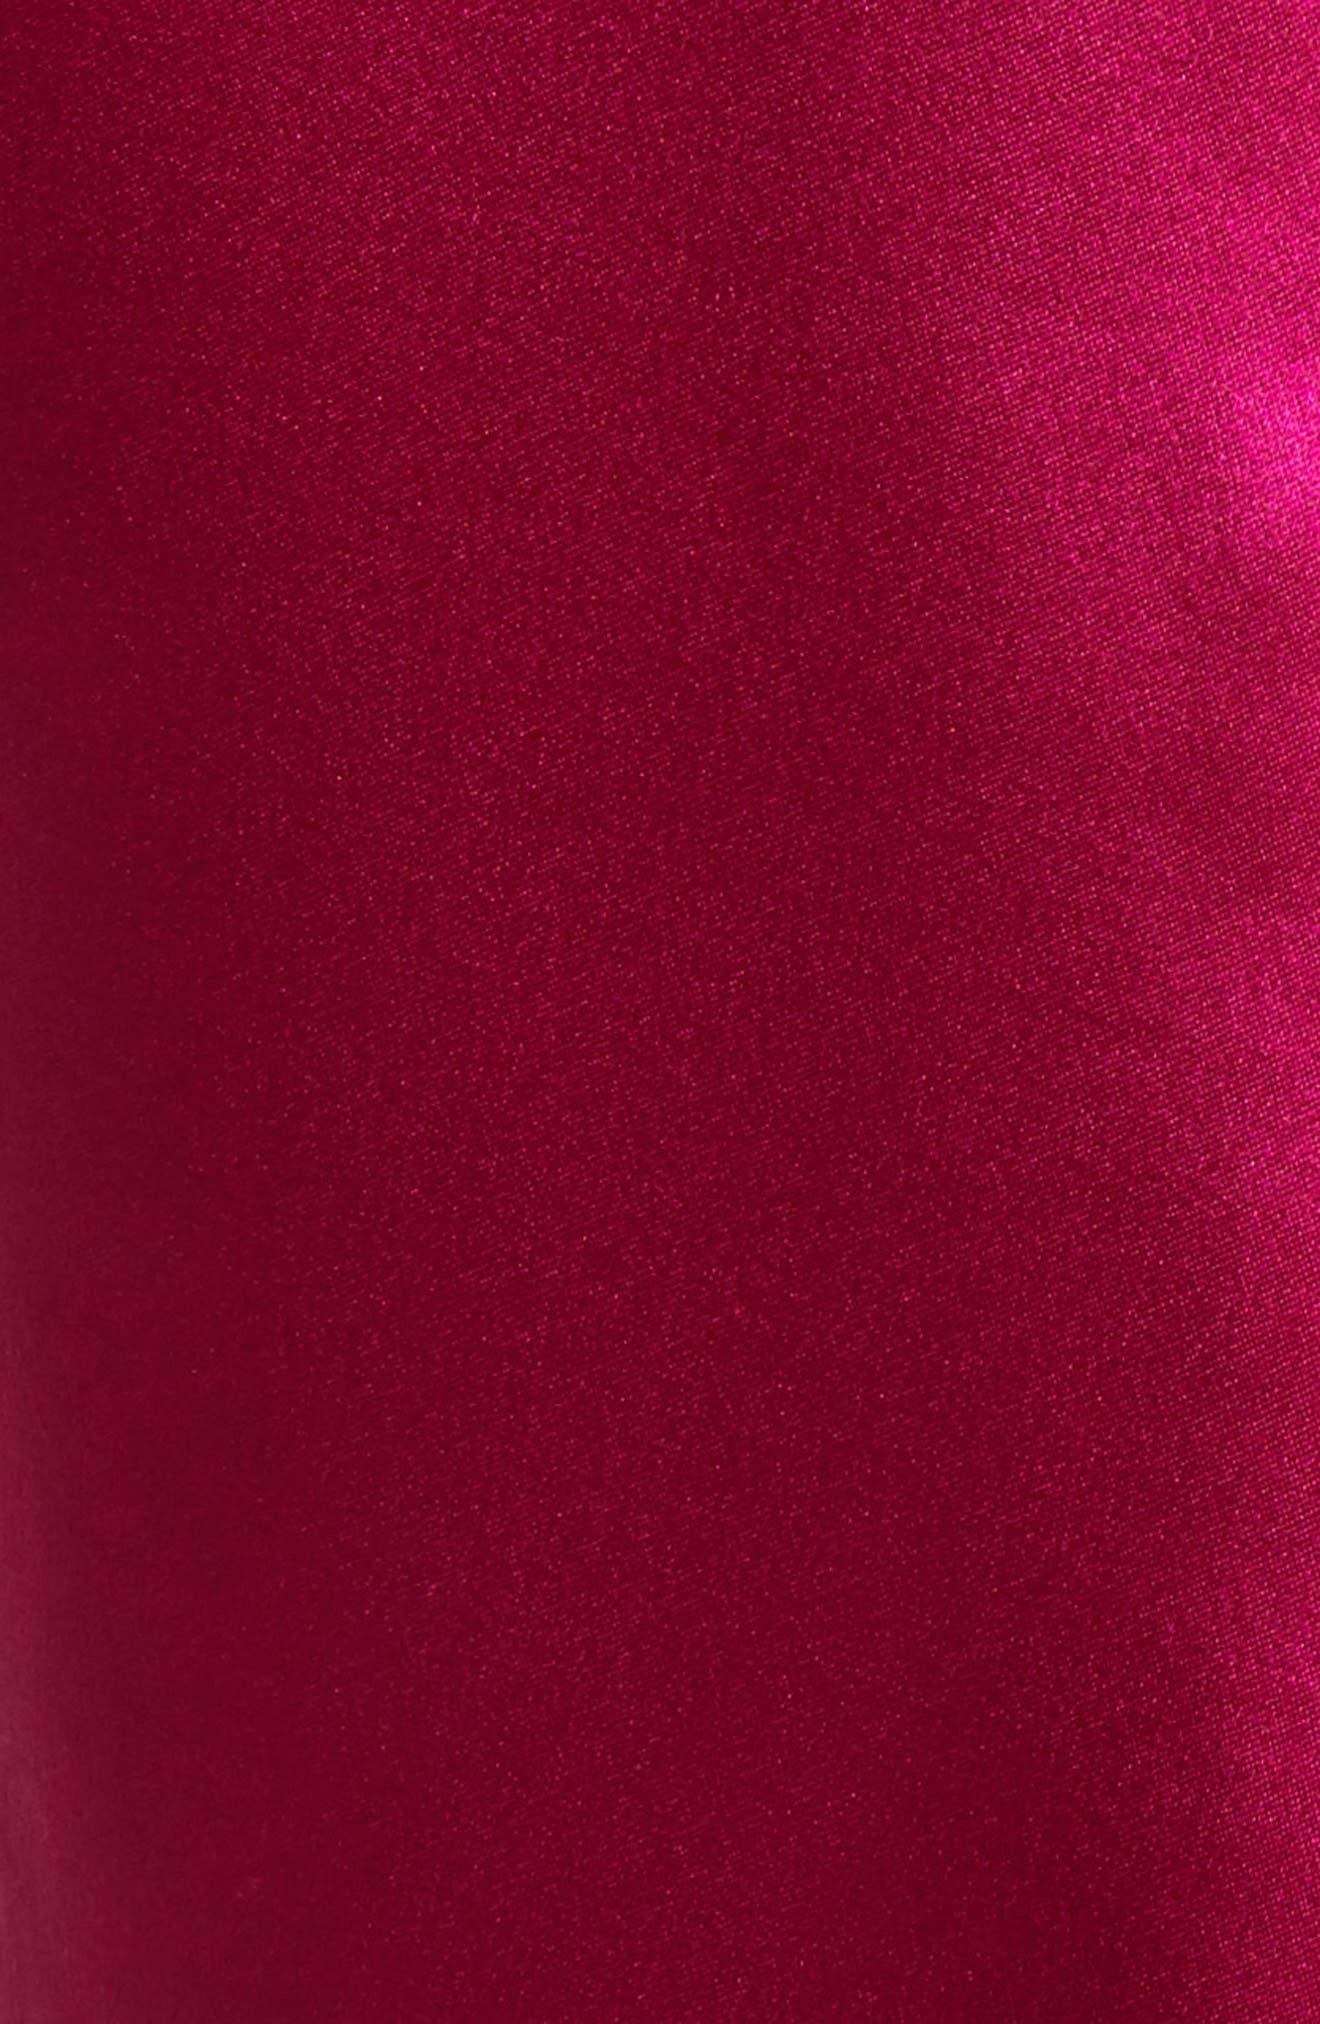 Zipper Detail Lacquered Silk Top,                             Alternate thumbnail 5, color,                             Magenta